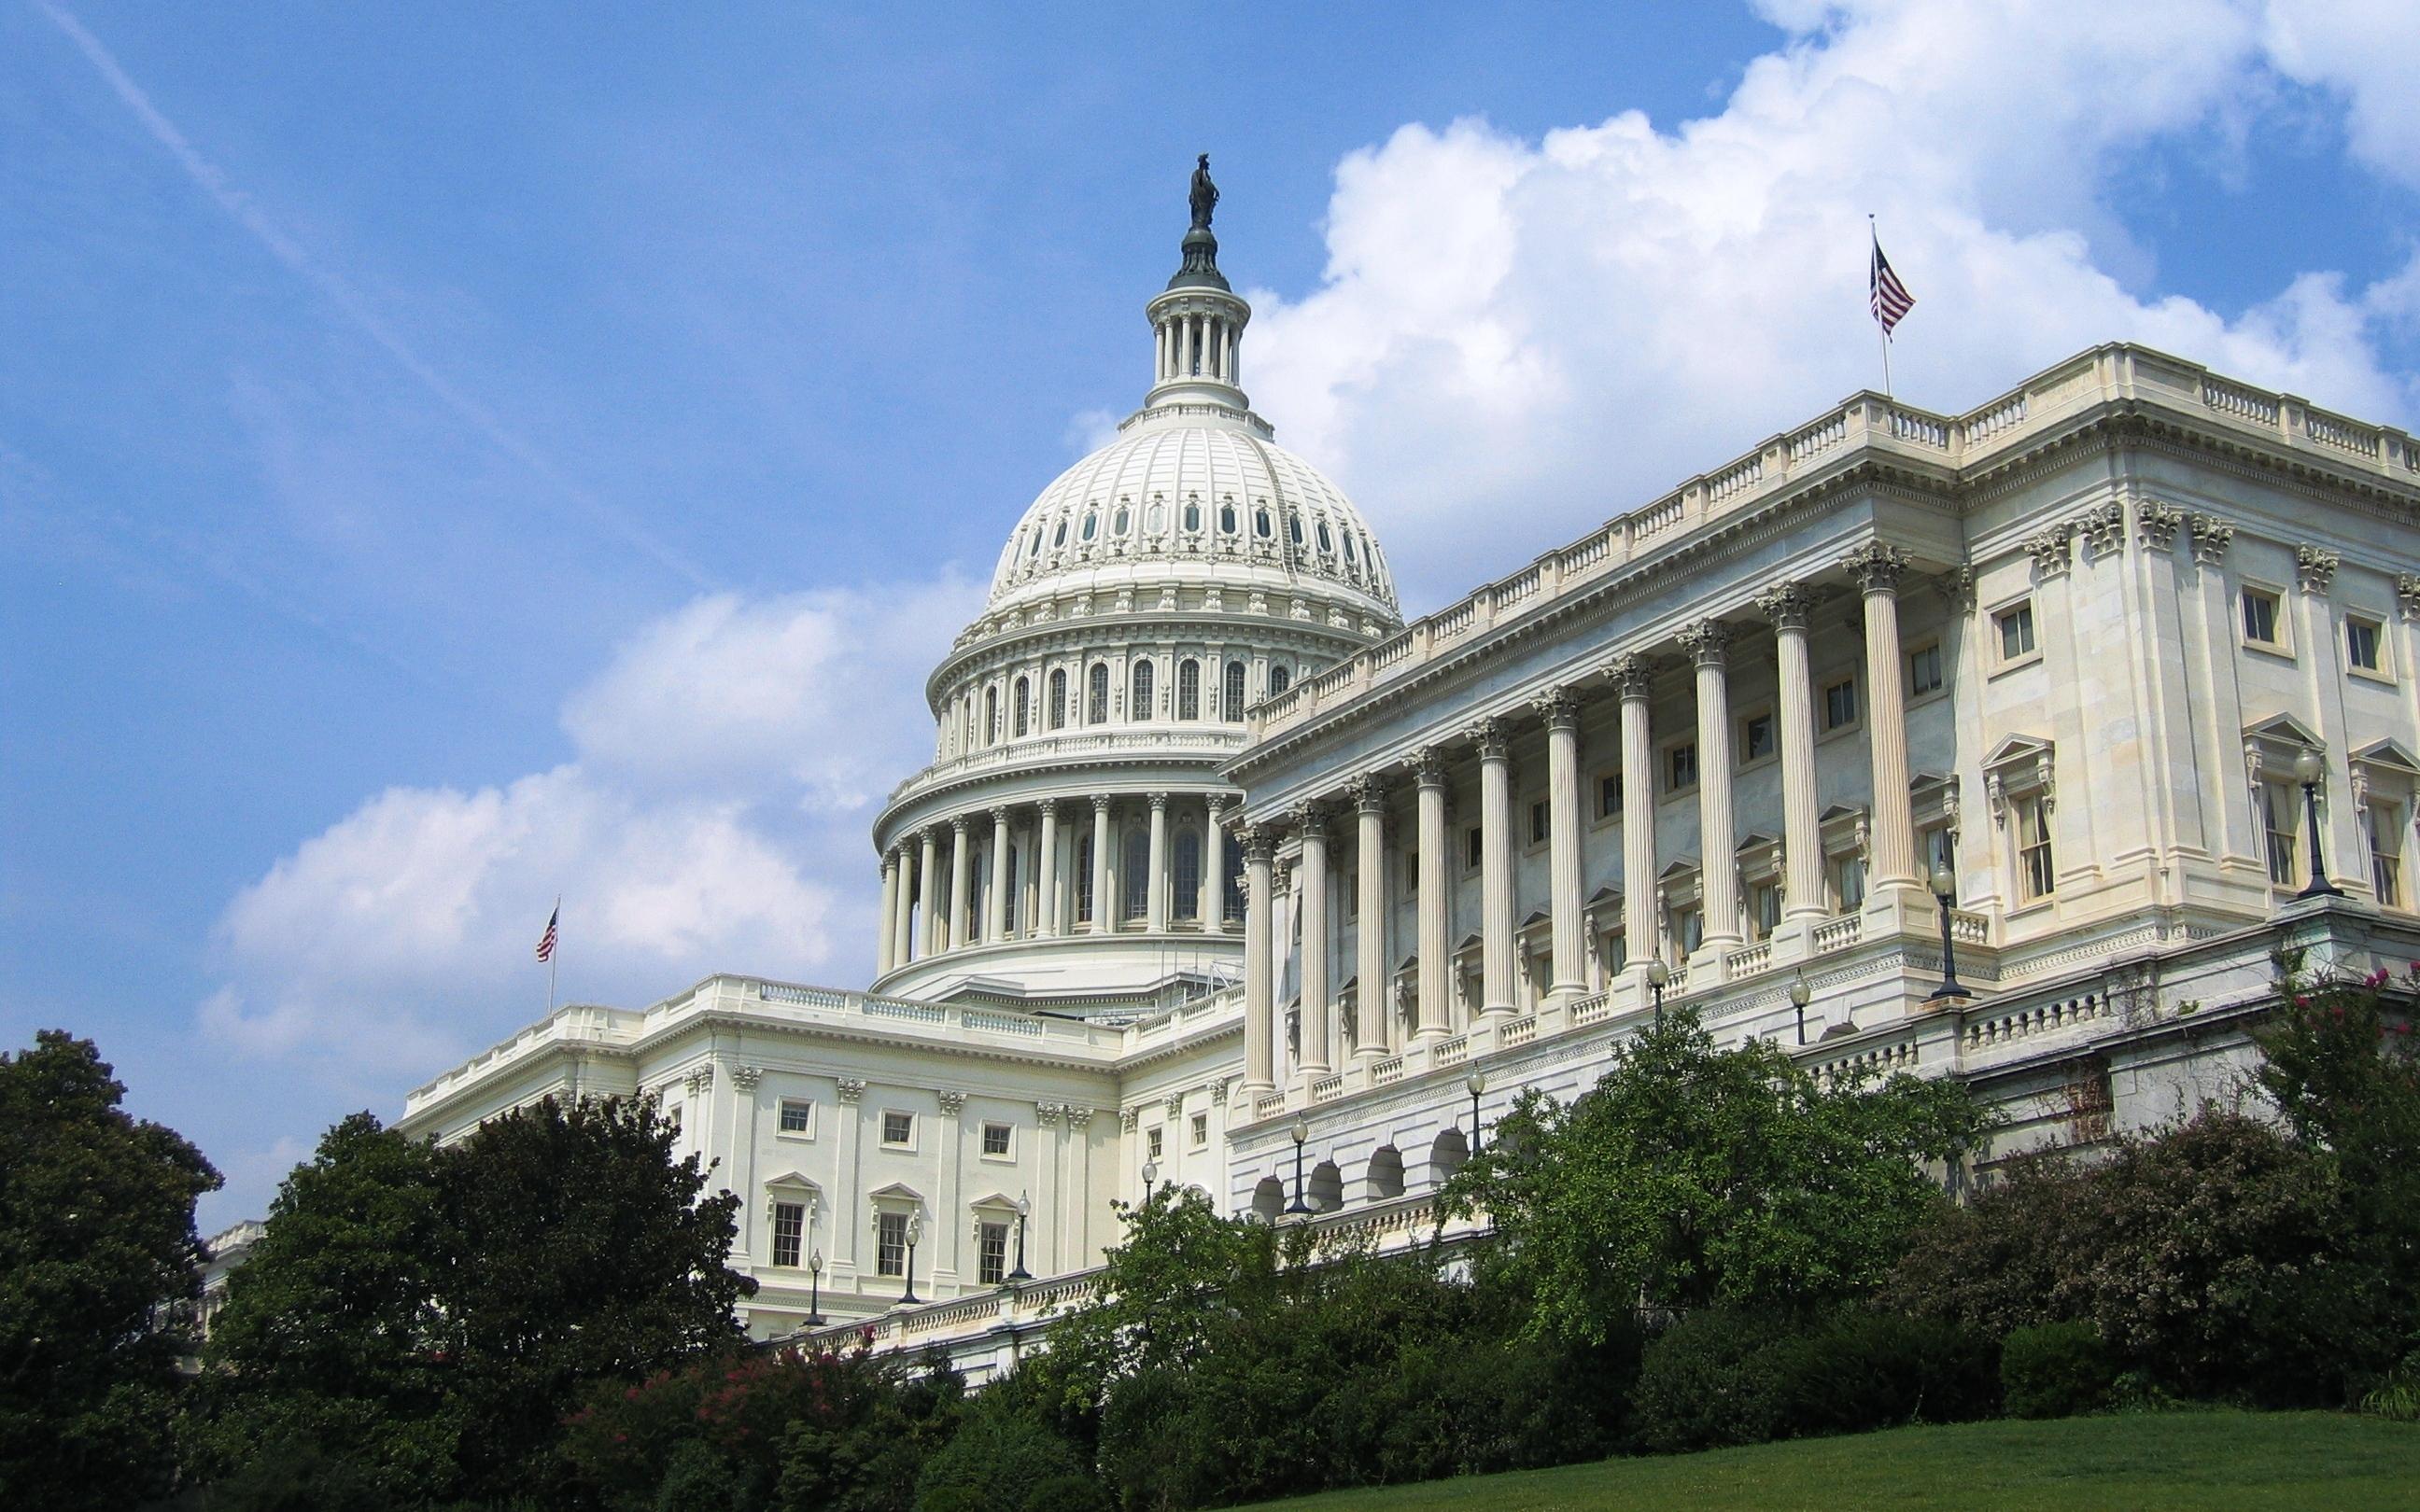 facade of US Capitol building